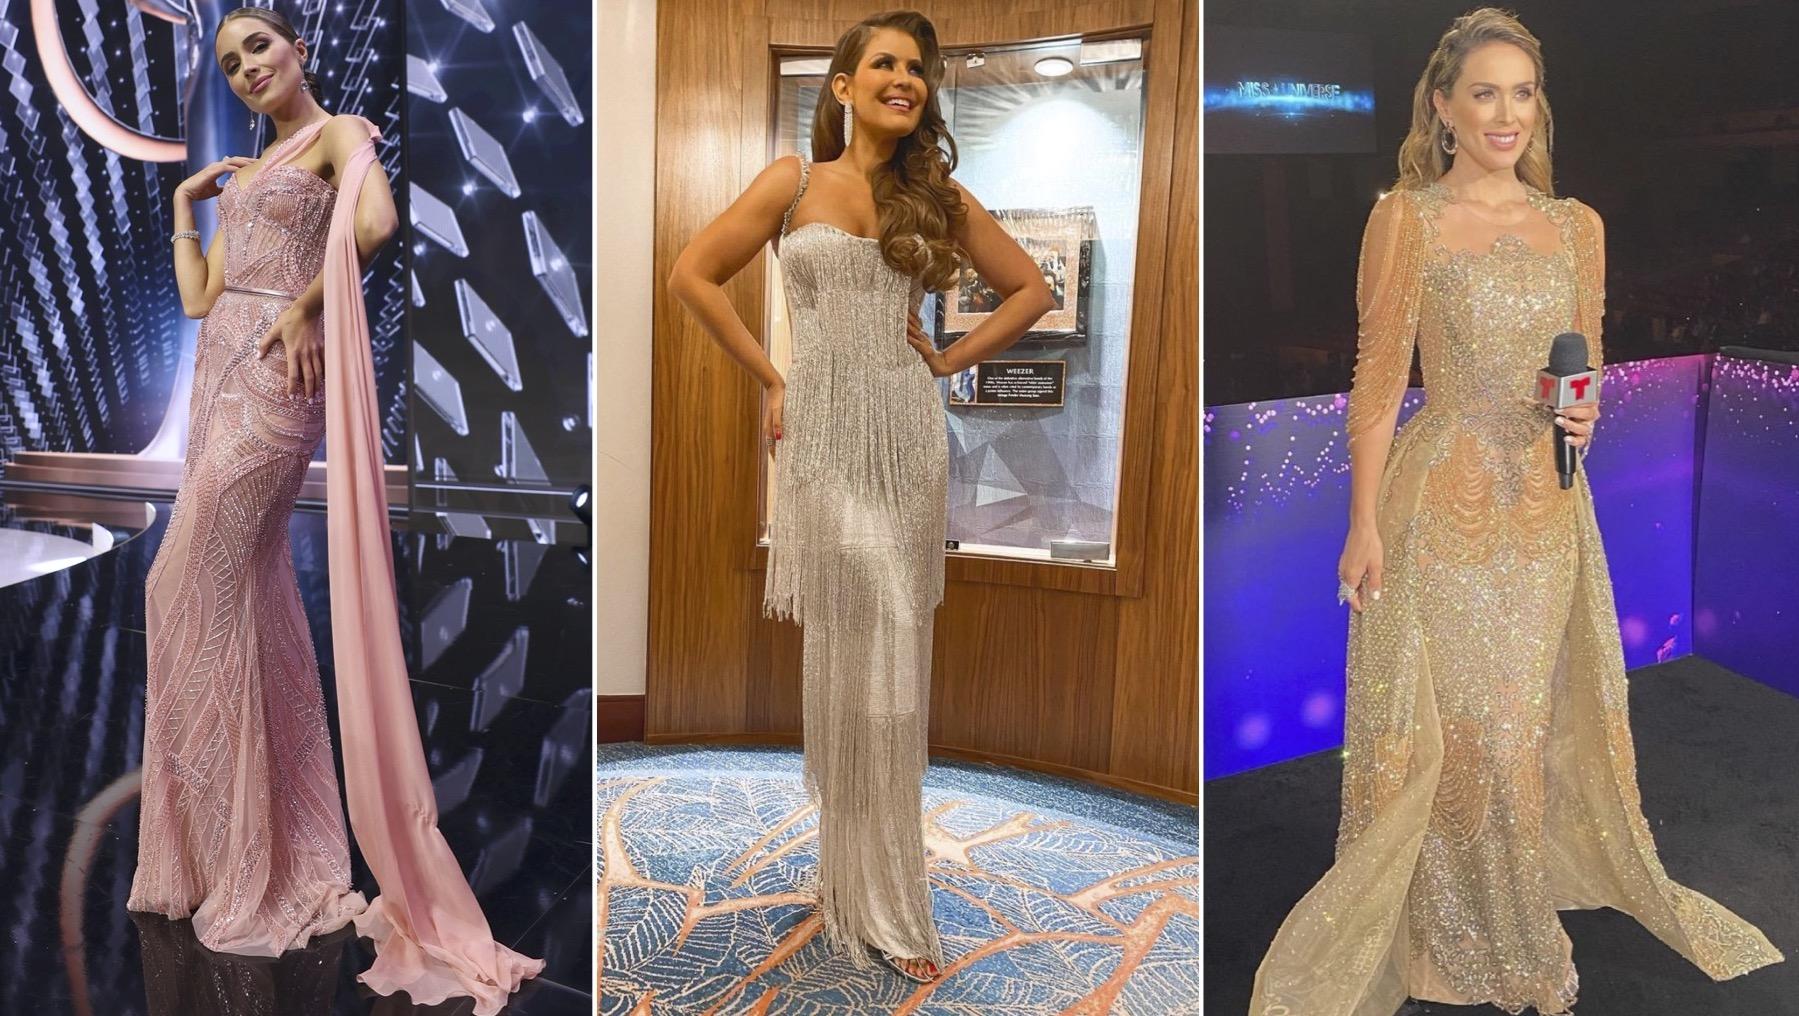 Miss Universo presentadoras, Olivia Culpo, Vanessa Claudio, Jacqueline Bracamontes